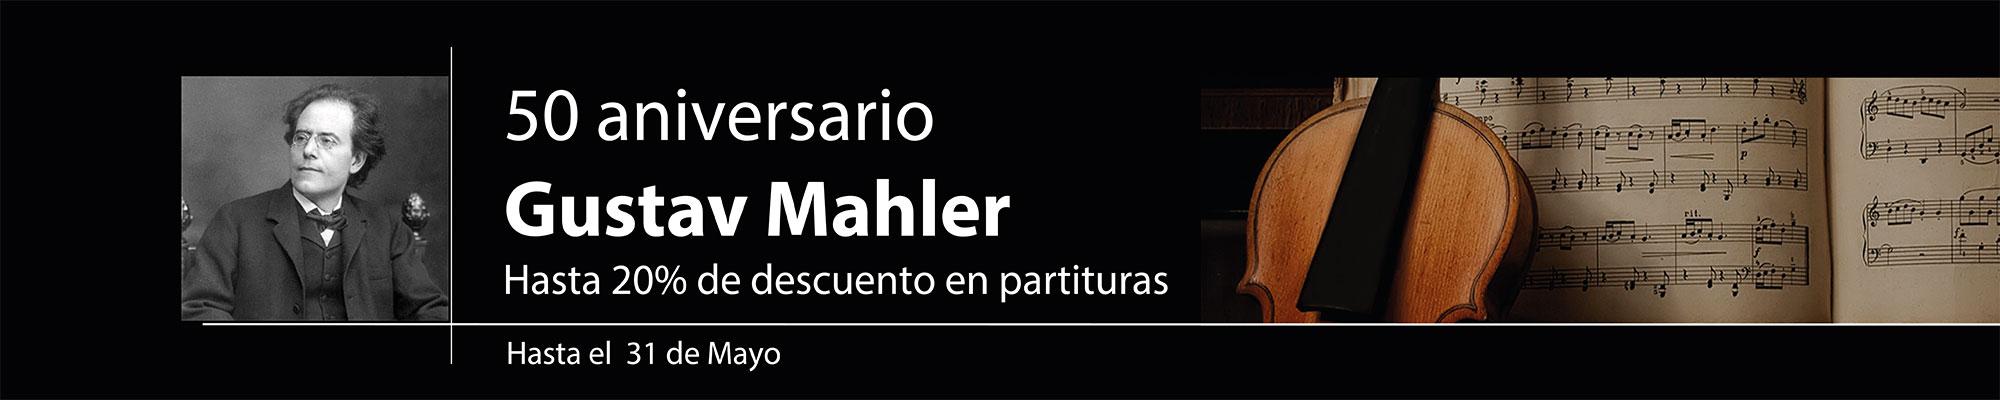 Aniversario Mahler